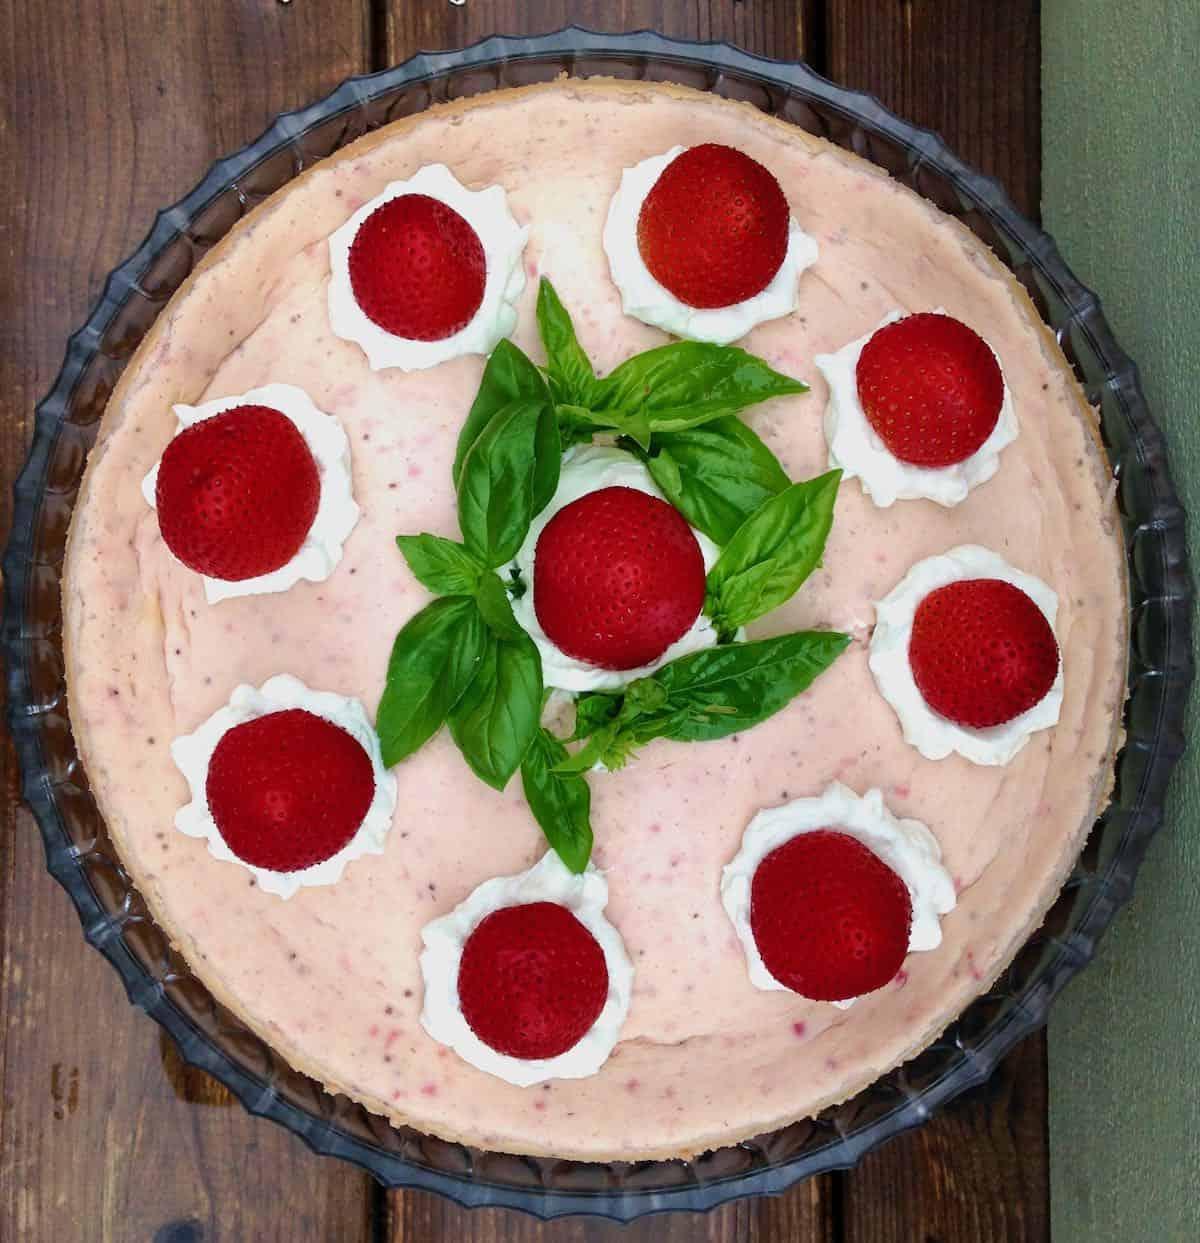 Basil Infused Strawberry Cheesecake